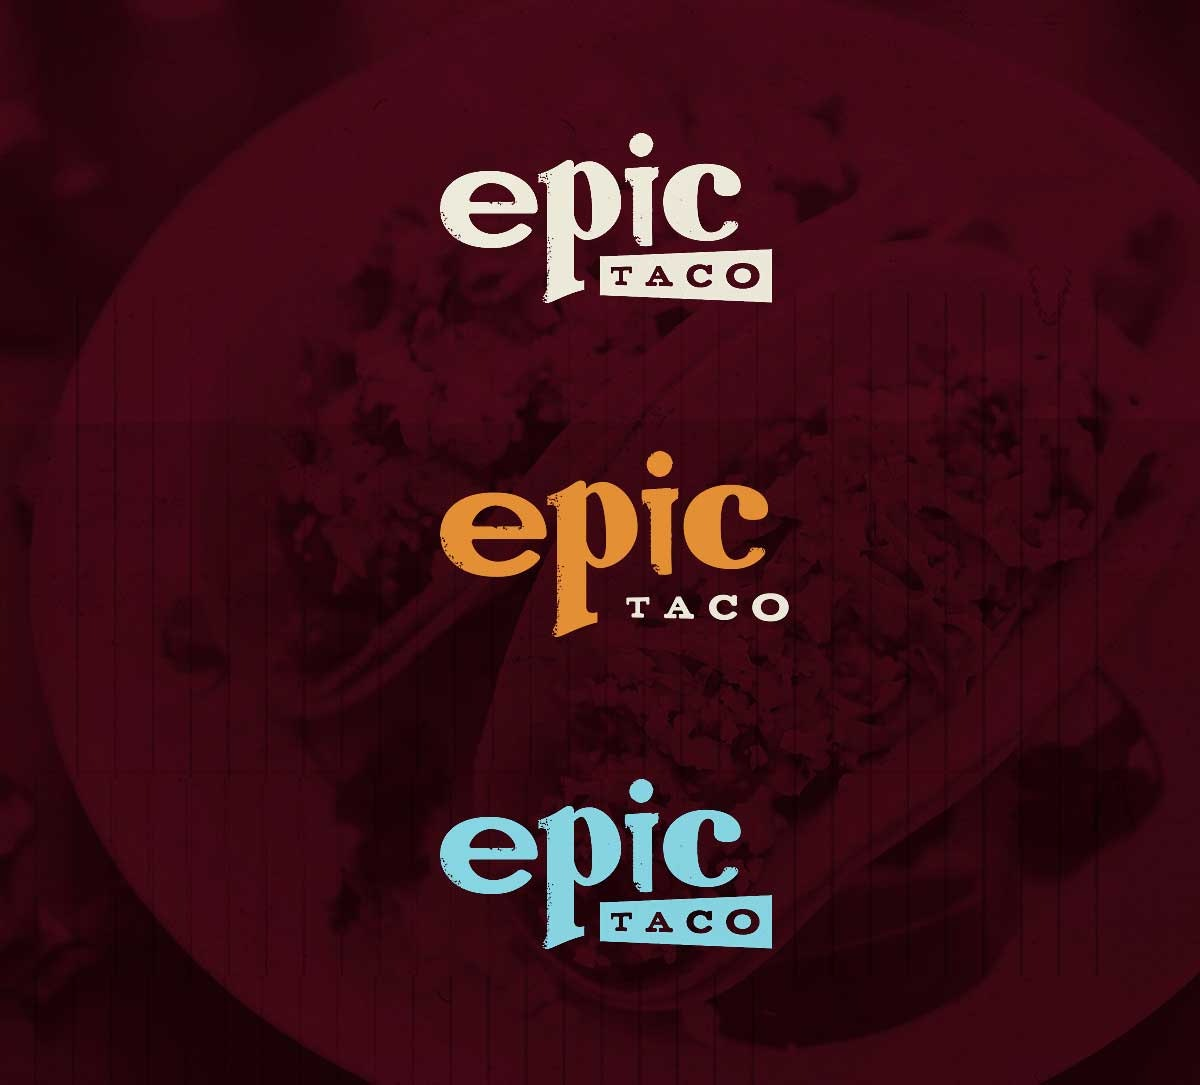 21 epic logo farbvarianten